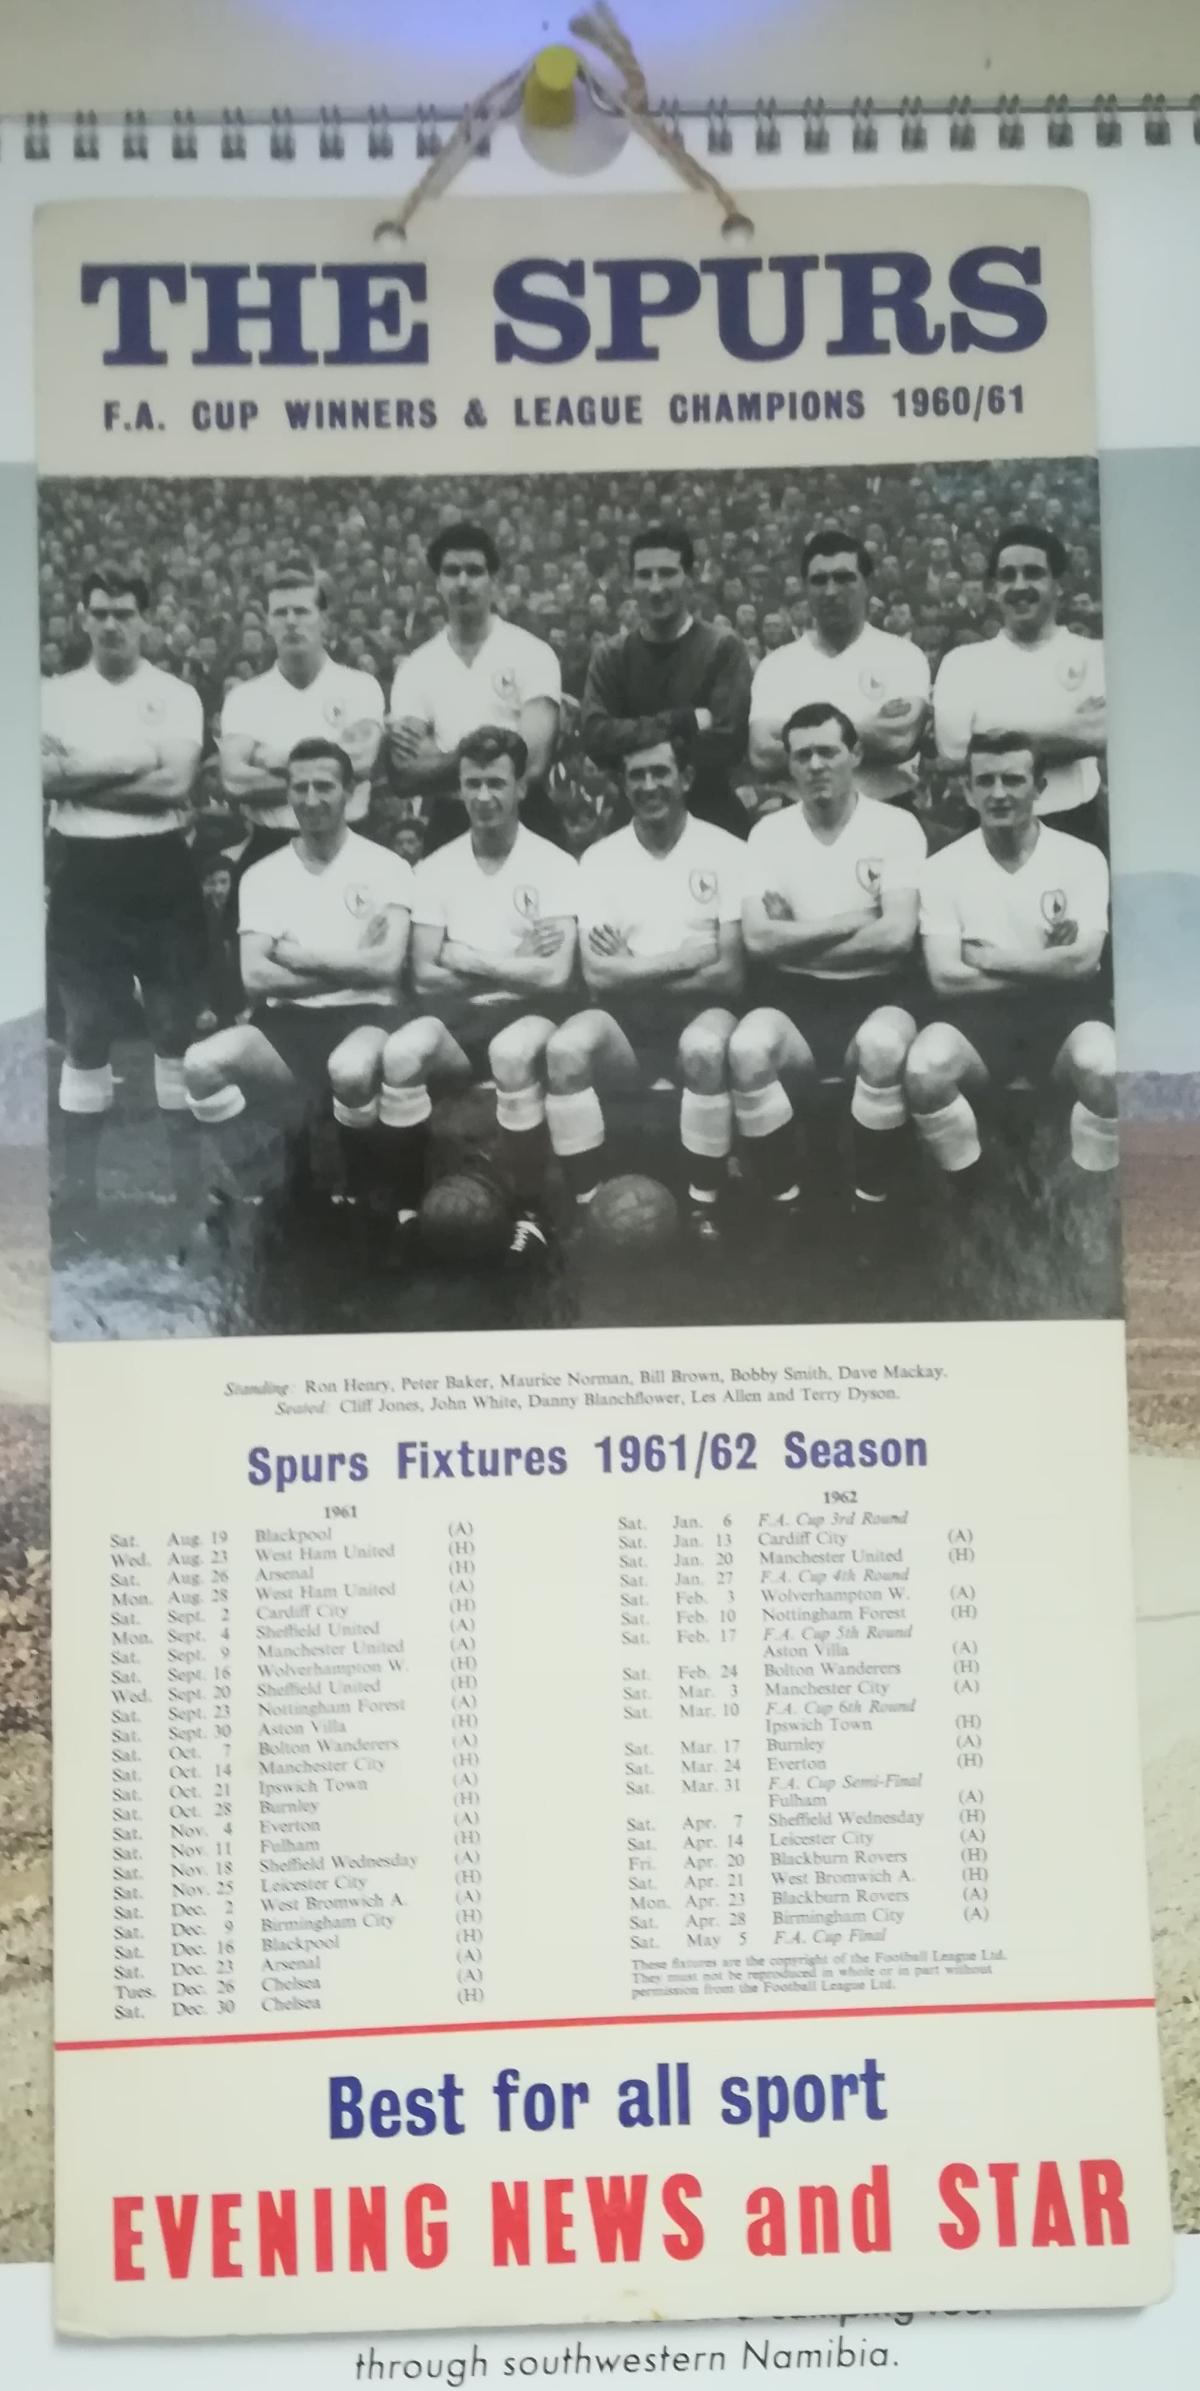 Tottenham Hotspur fixture list collector